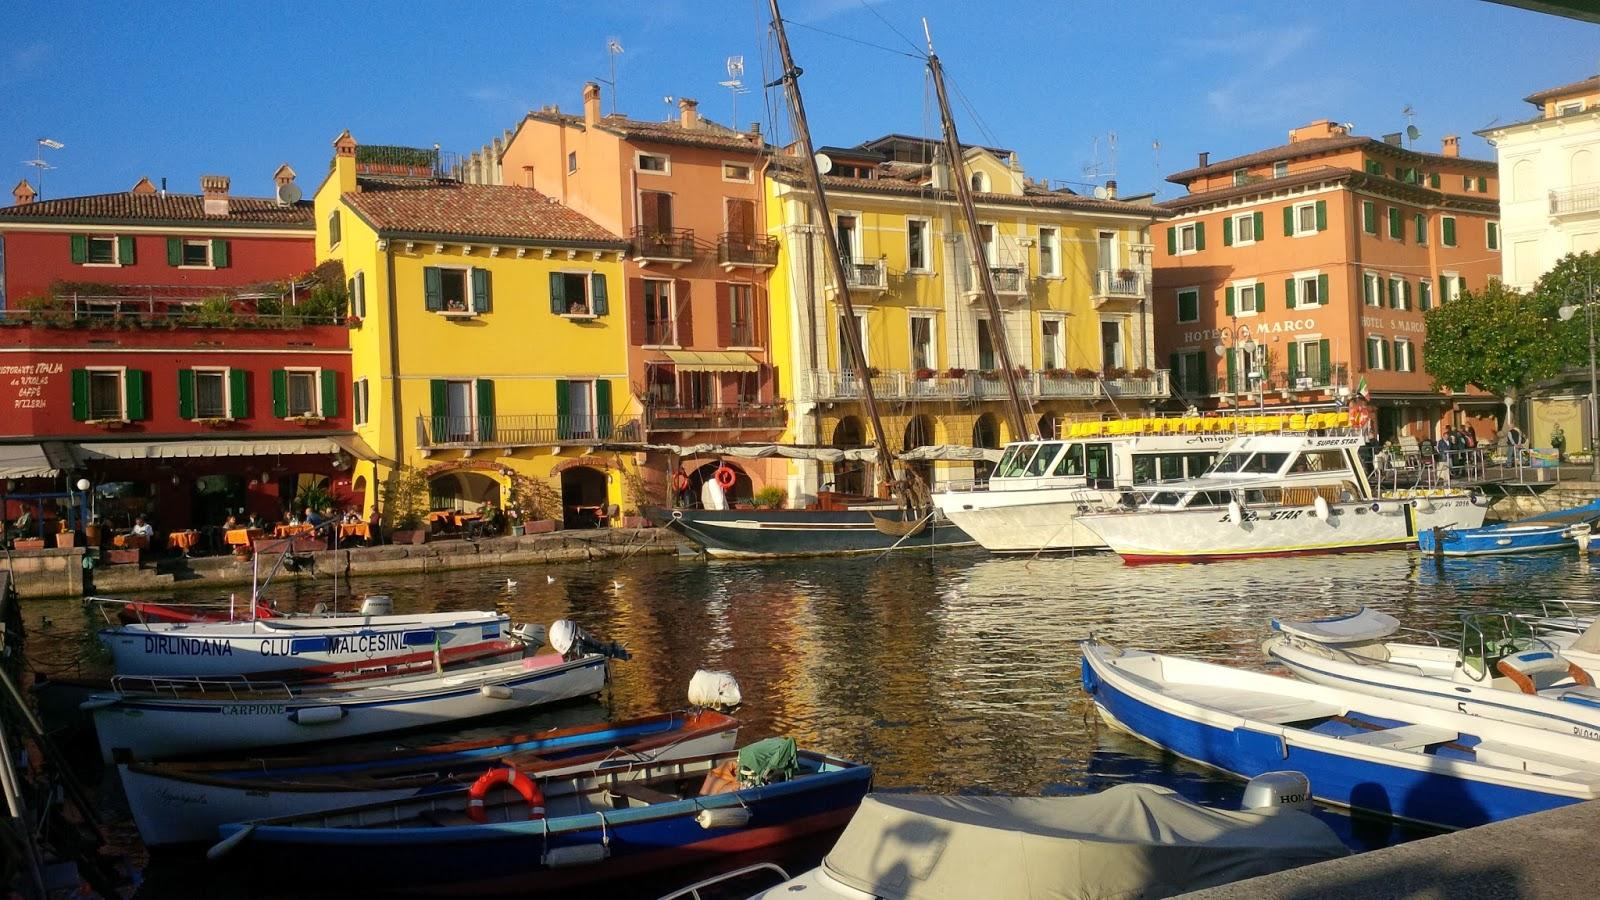 Malcesine's harbour, Lake Garda - Veneto, Italy - www.rossiwrites.com